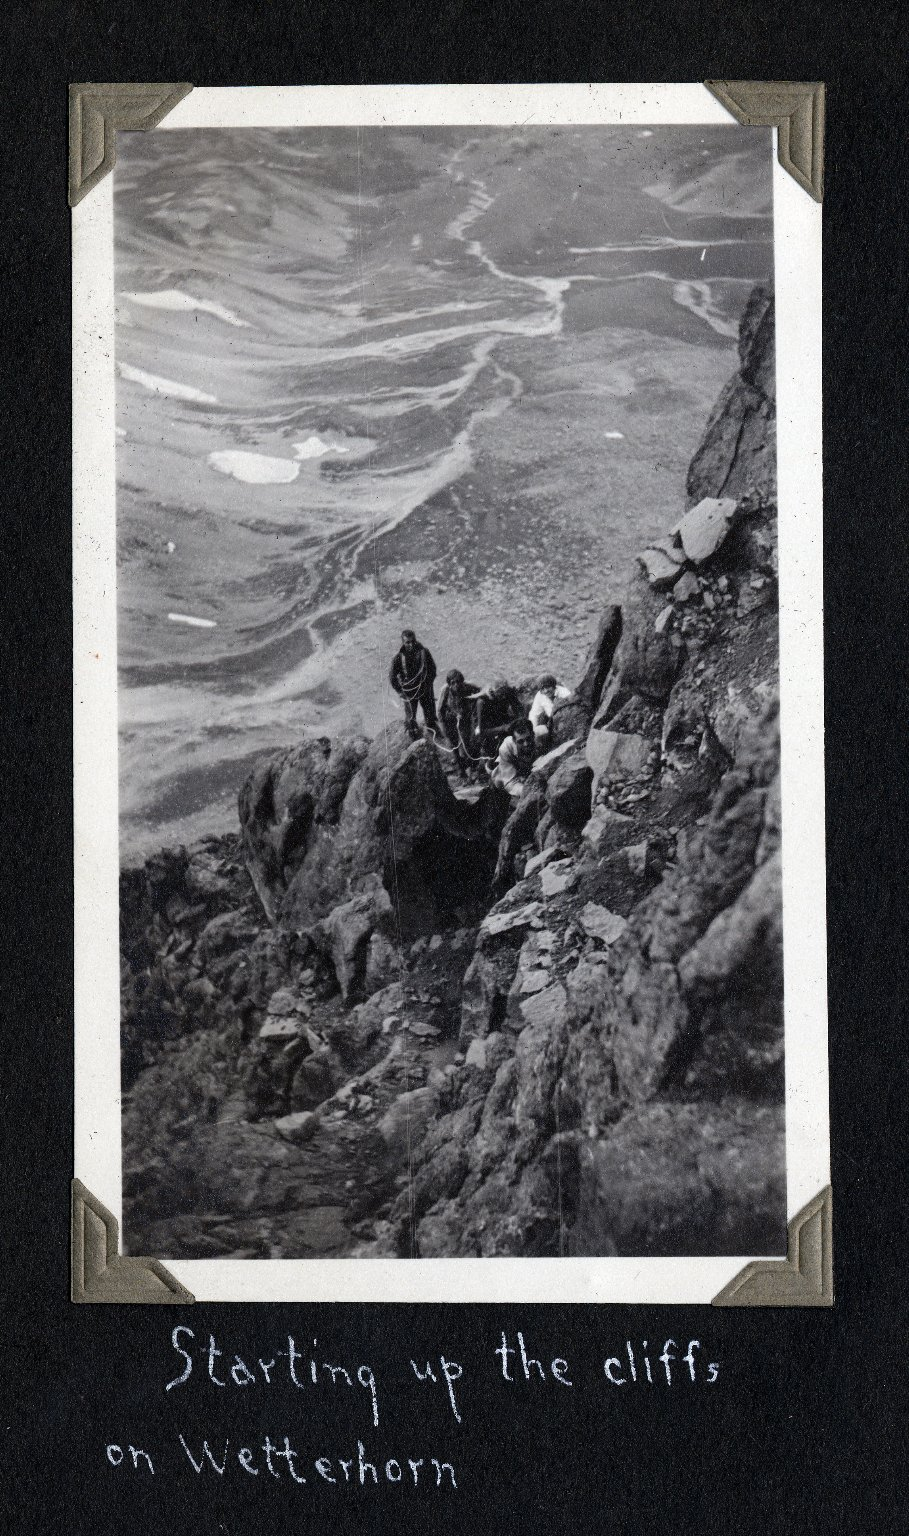 Starting up the cliffs on Wetterhorn Peak